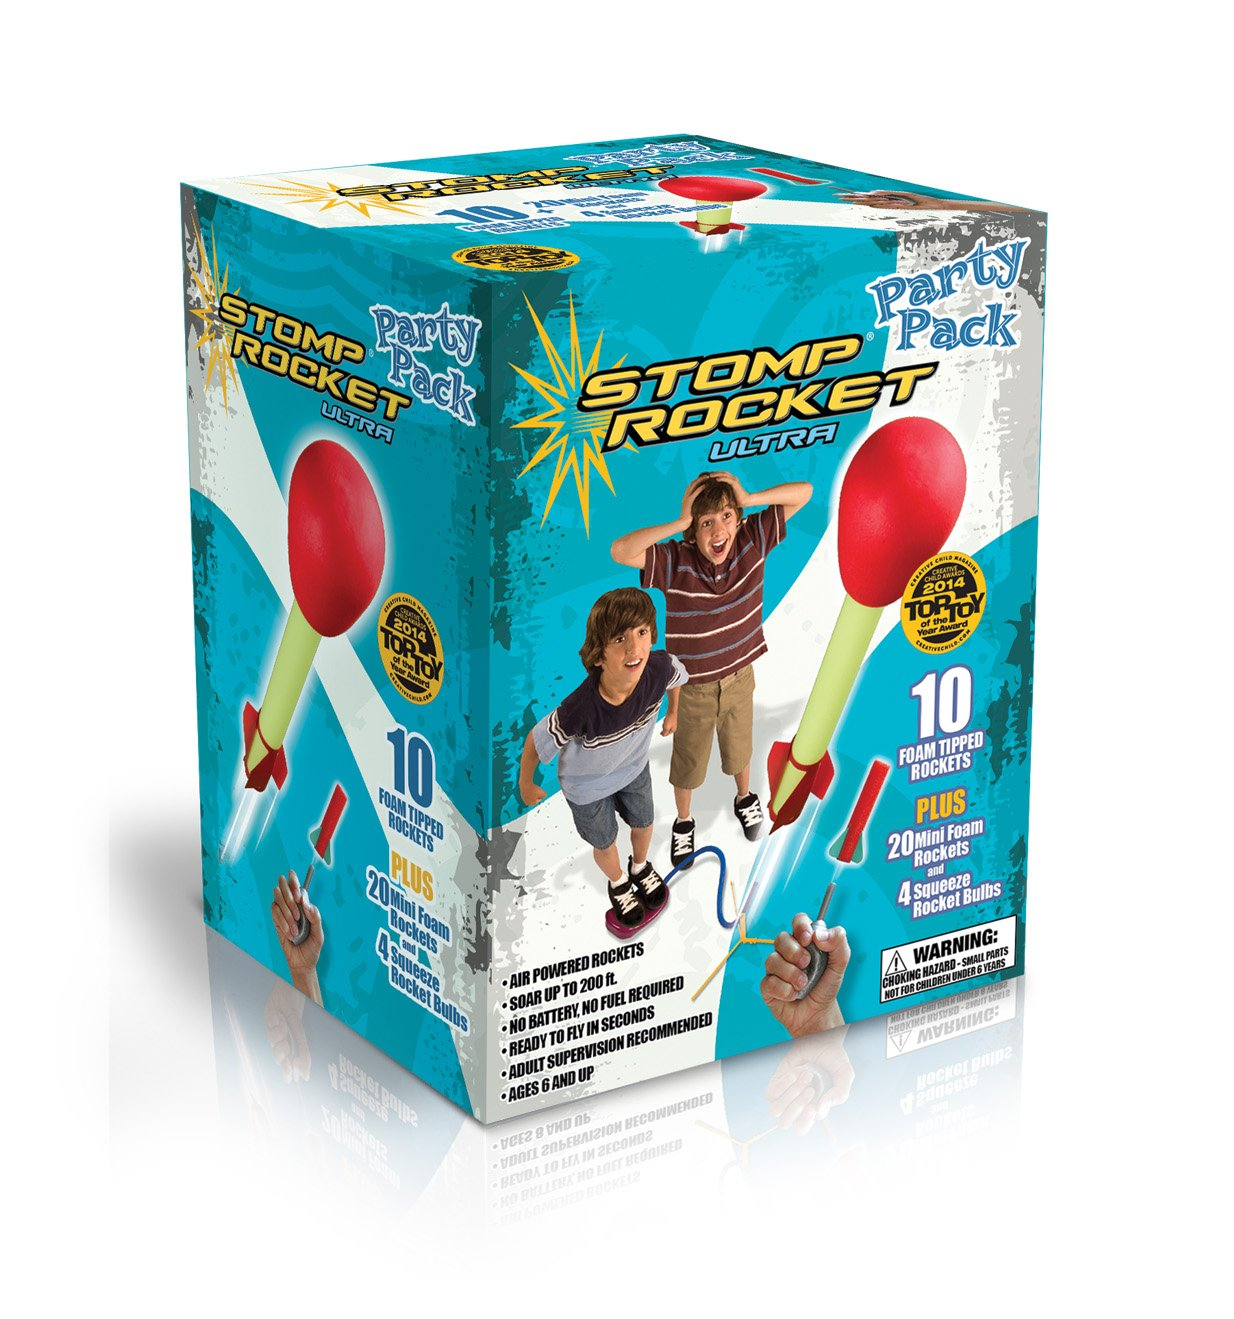 Stomp Rocket Ultra Rocket Party Pack, 30 Rocket Combo